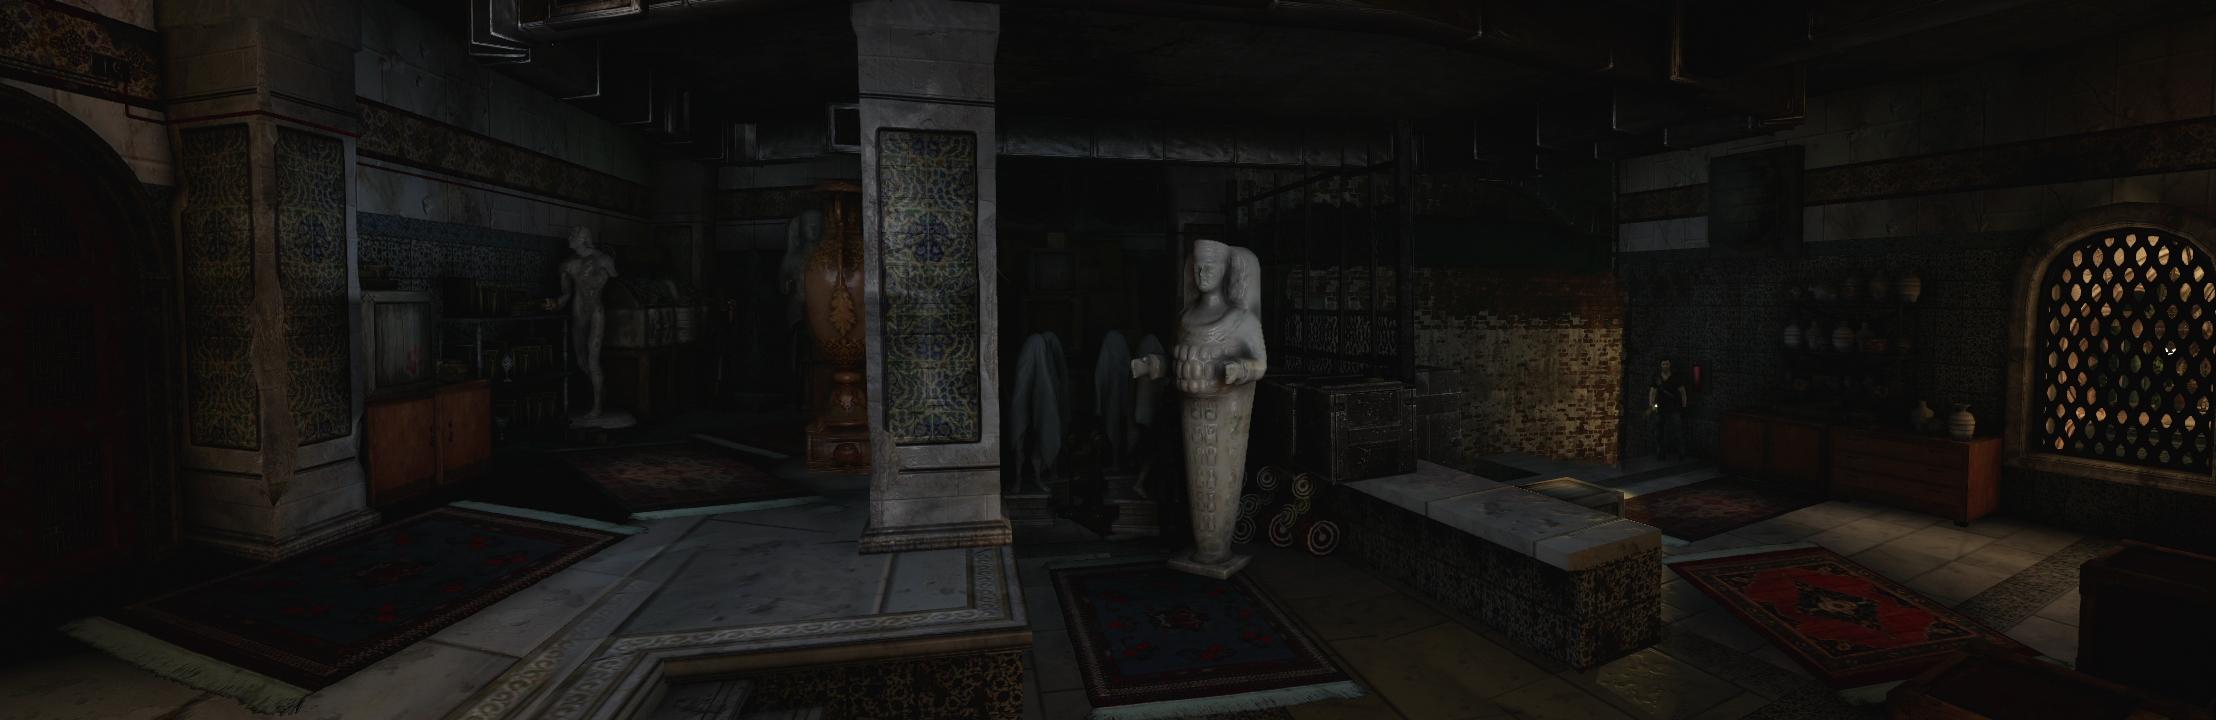 iTqhu1BfB2ROW.jpg - Uncharted 2: Among Thieves